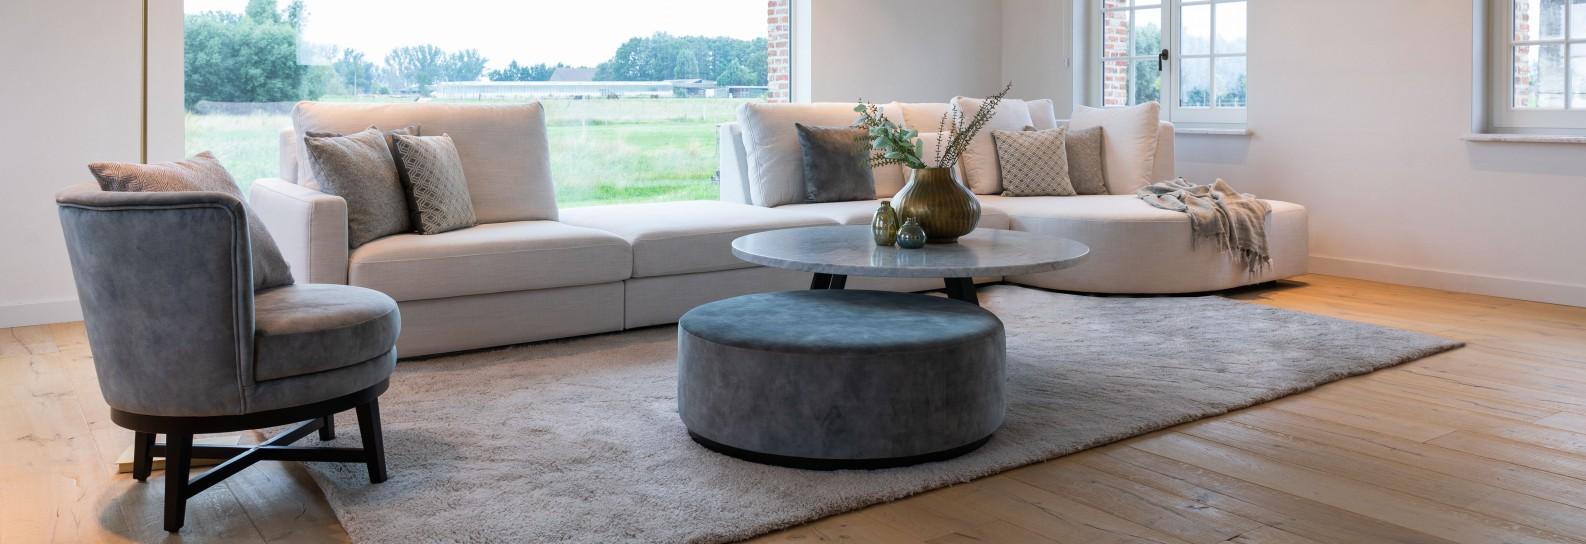 sofa puro seat glory